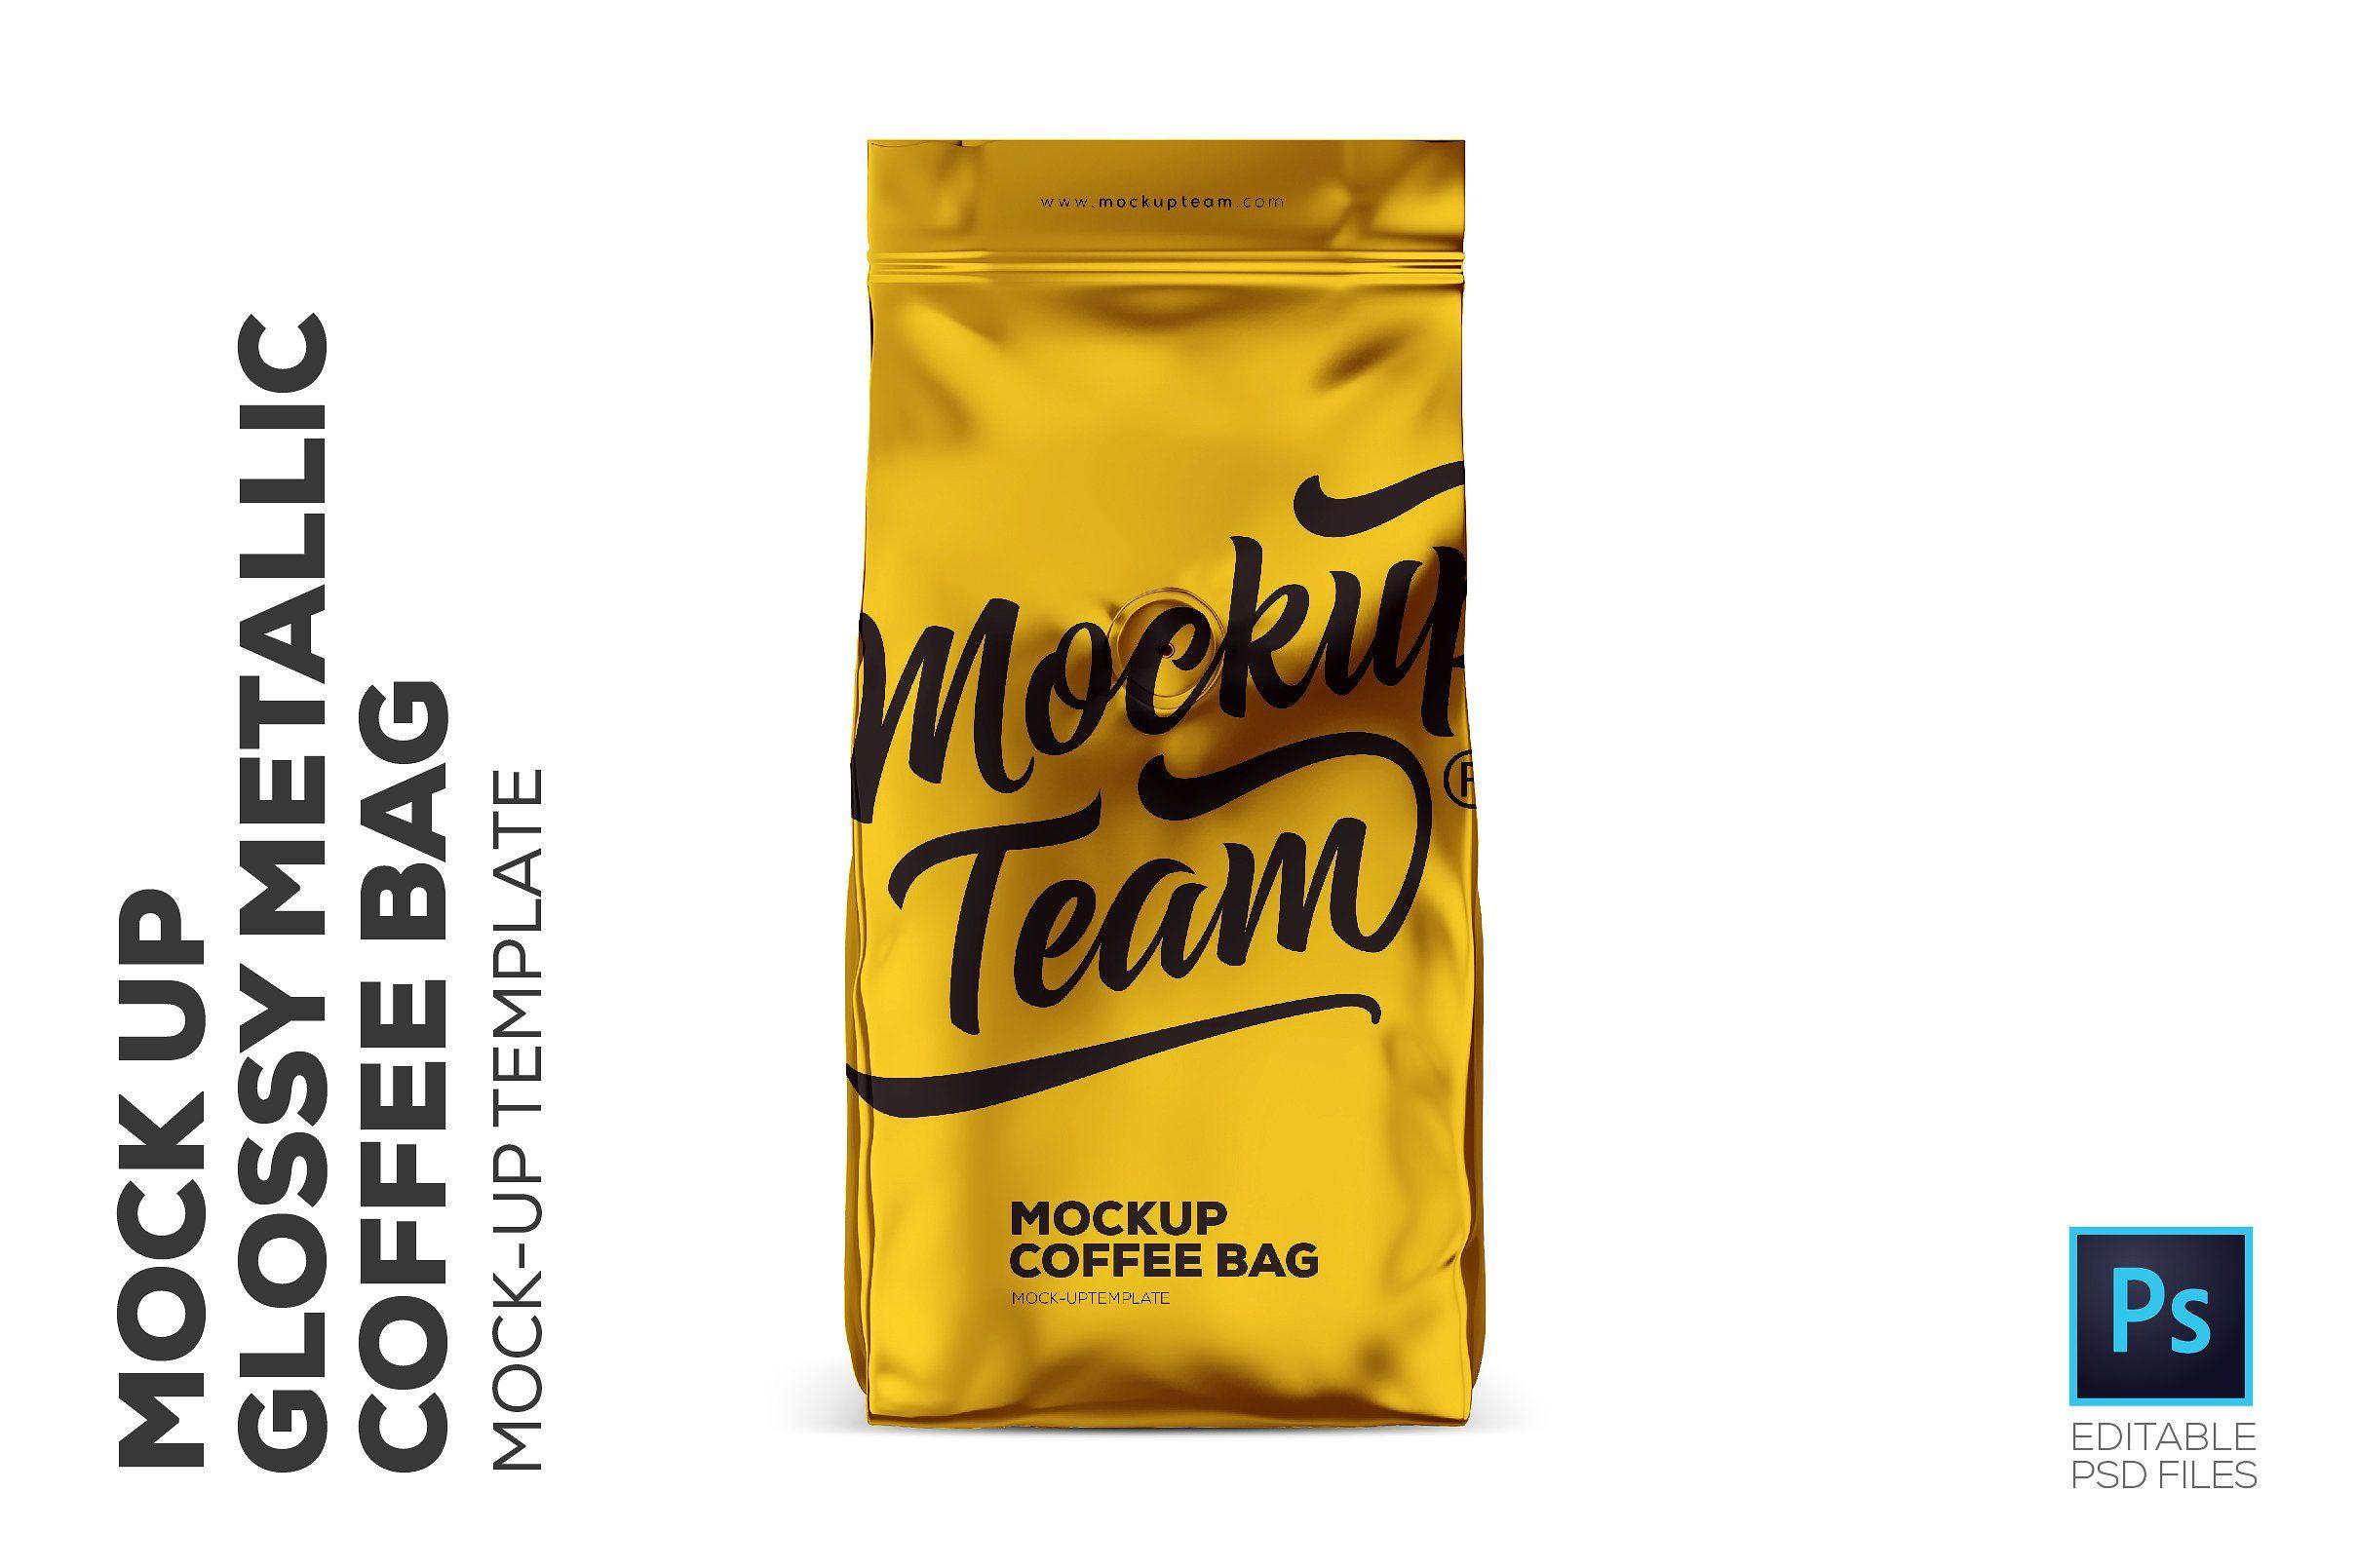 Download Glossy Metallic Coffee Bag Mockup Background Place Clean Transparent Bag Mockup Coffee Bag Mockup Free Psd